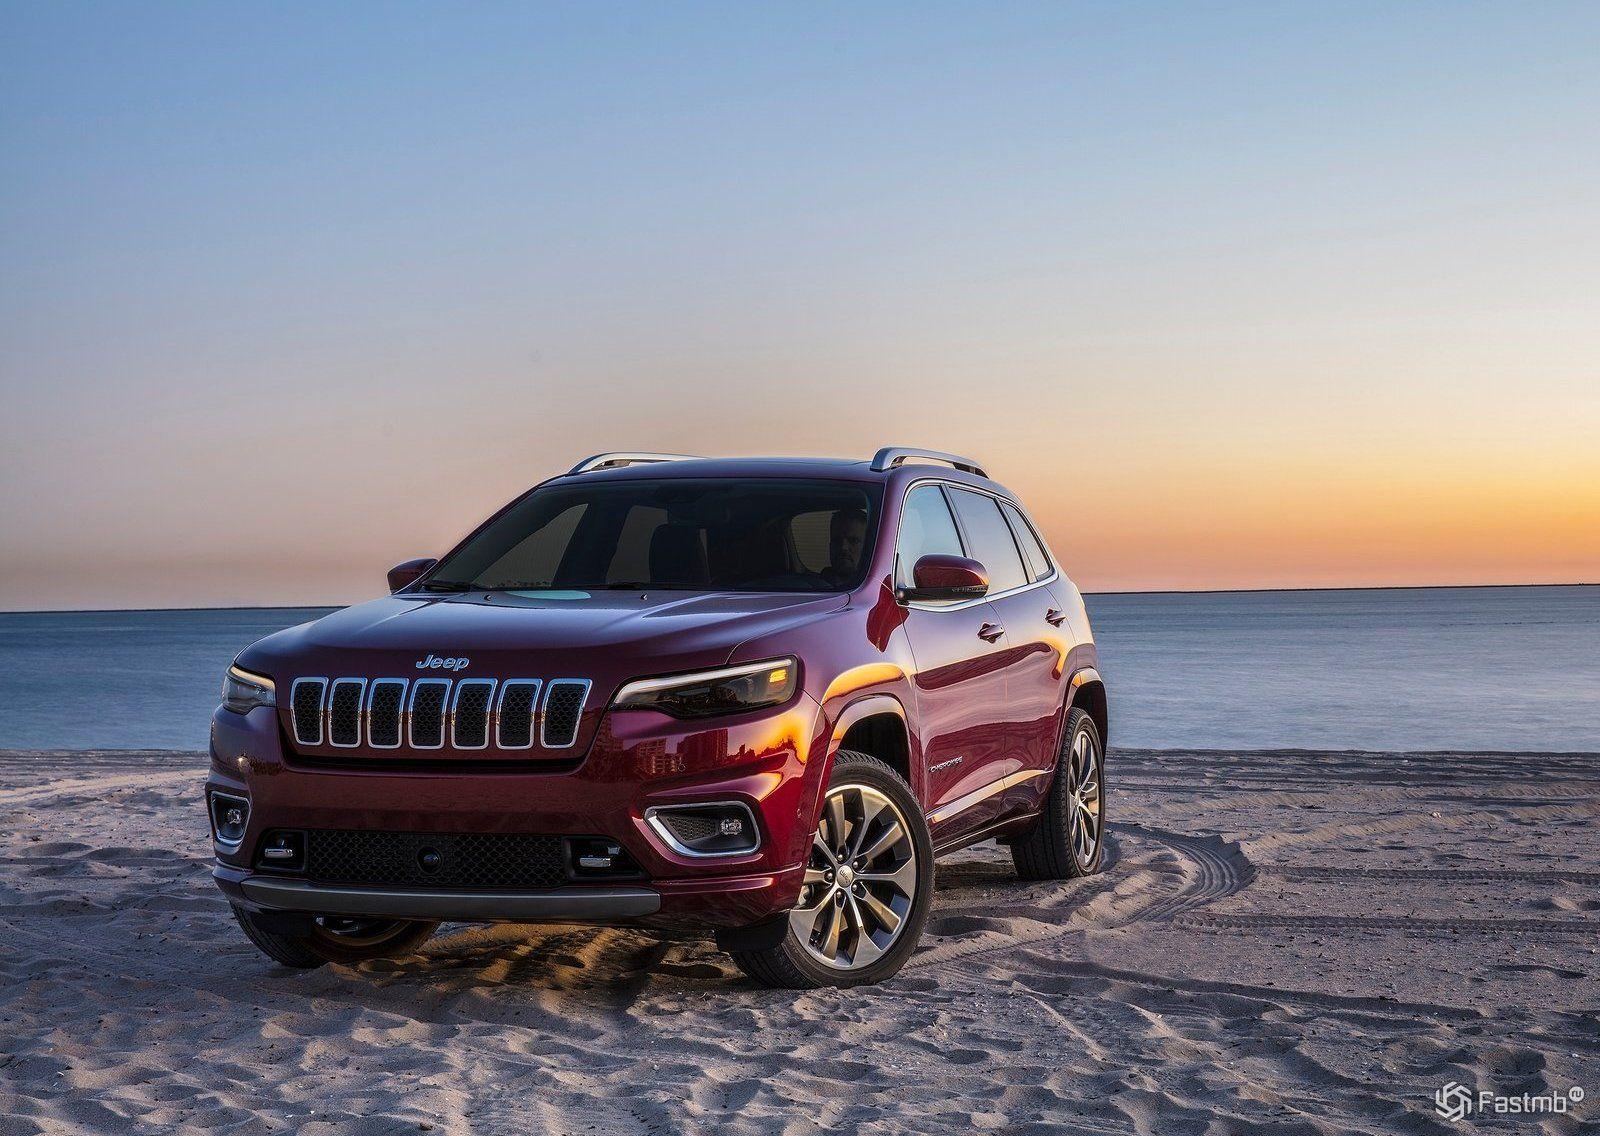 Jeep Cherokee 2018-2019  характеристики bde970497cc8b